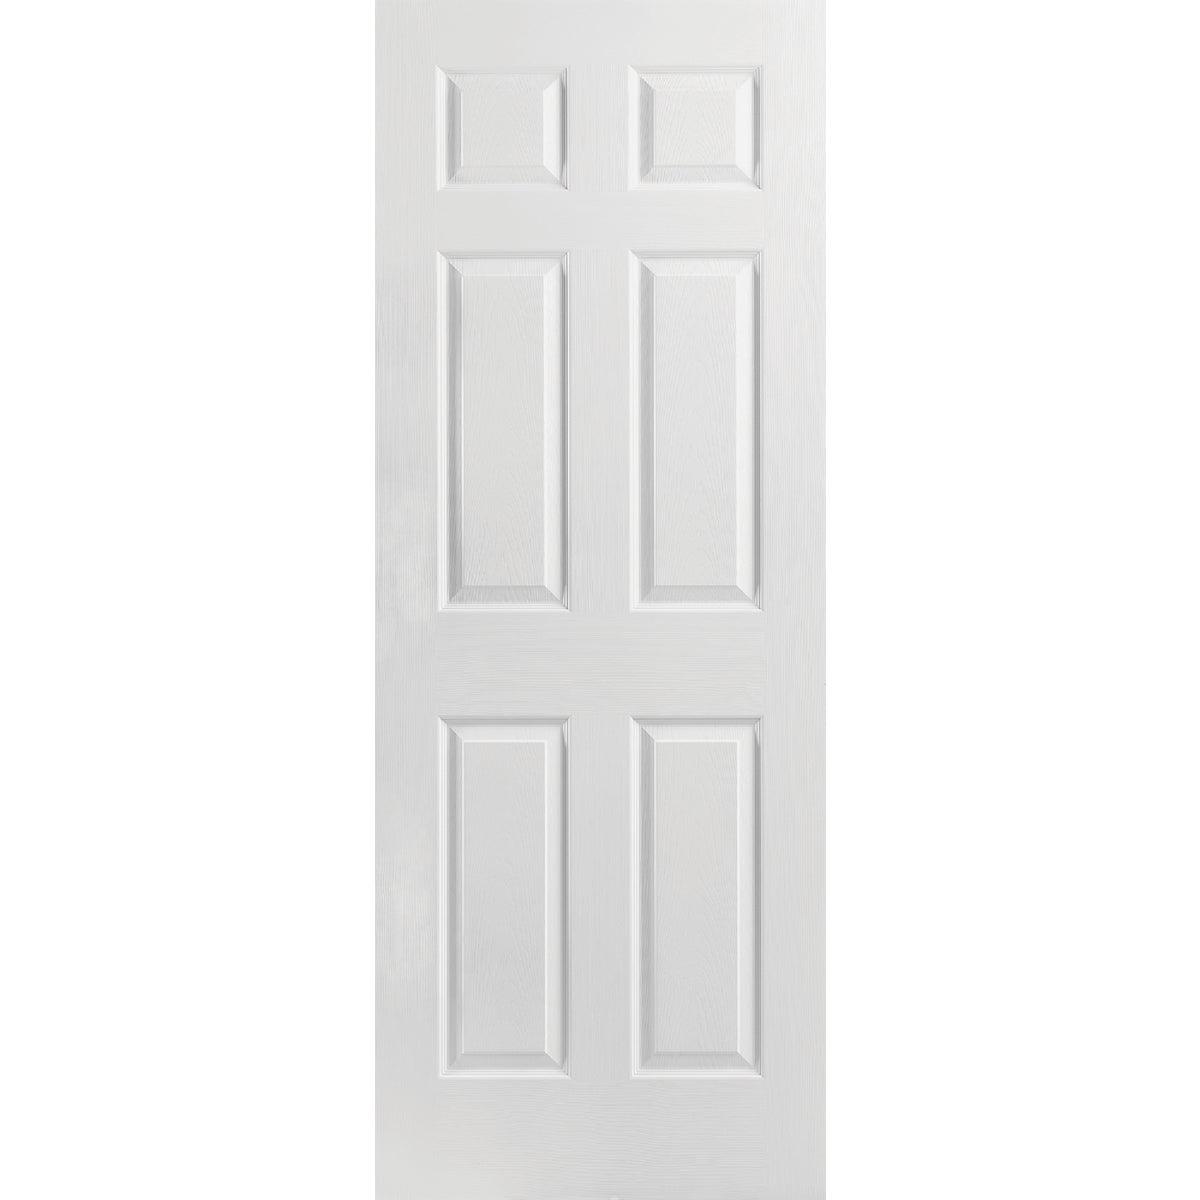 Masonite 3/0 1-3/8 6PN TX HC DOOR